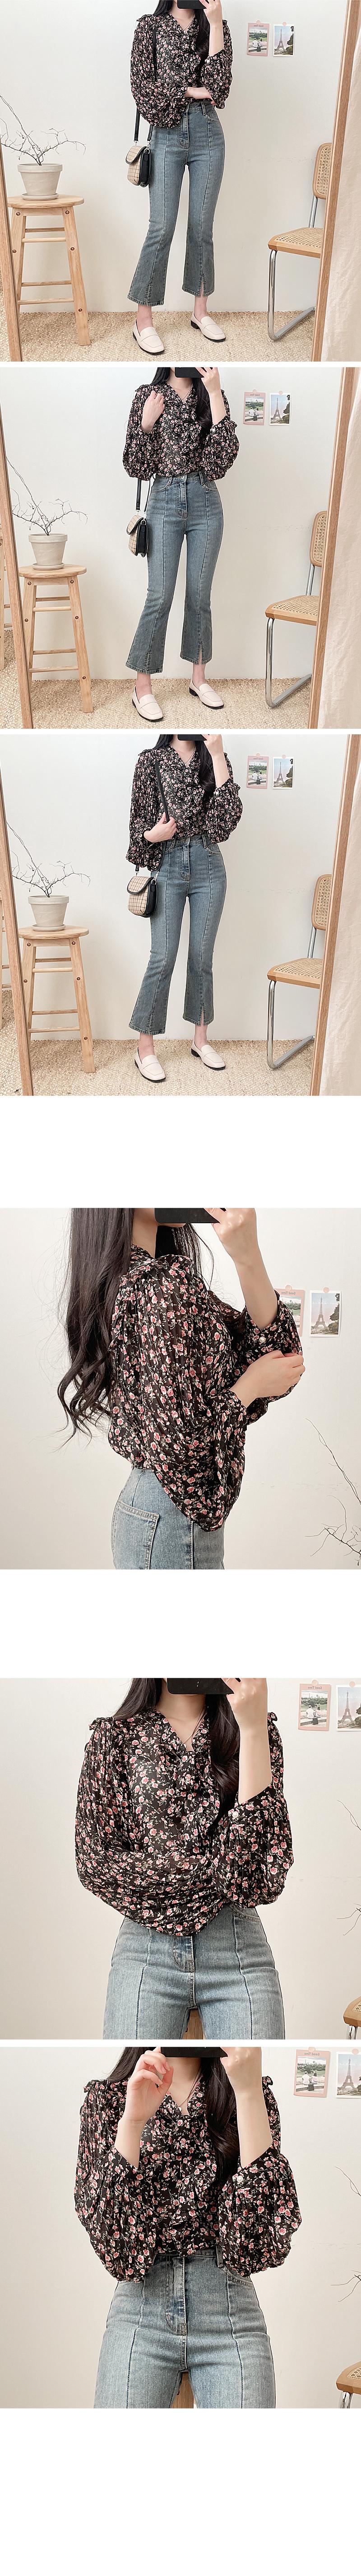 Winkle frill blouse